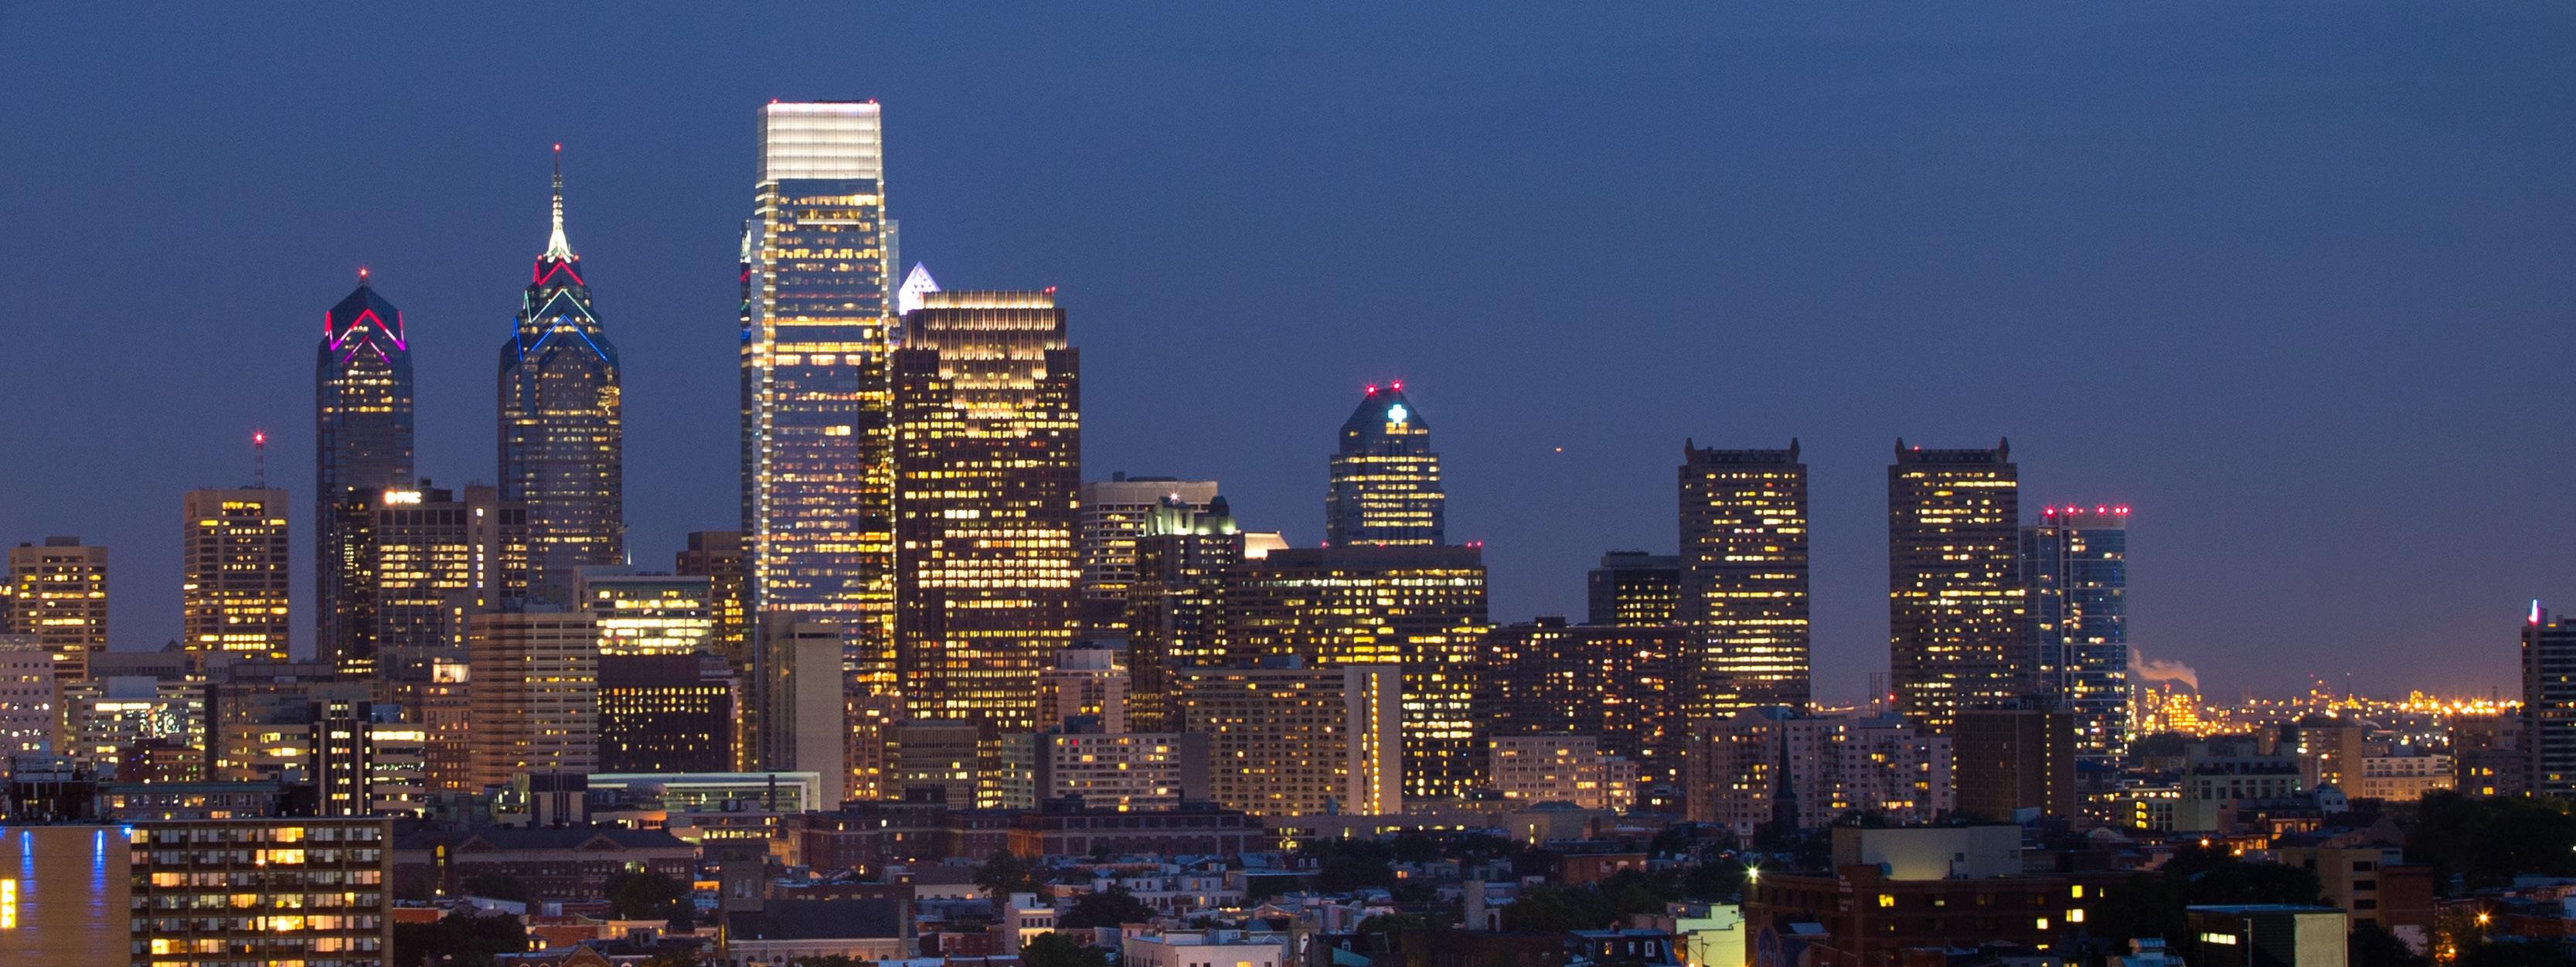 Skyline image of Philadelphia